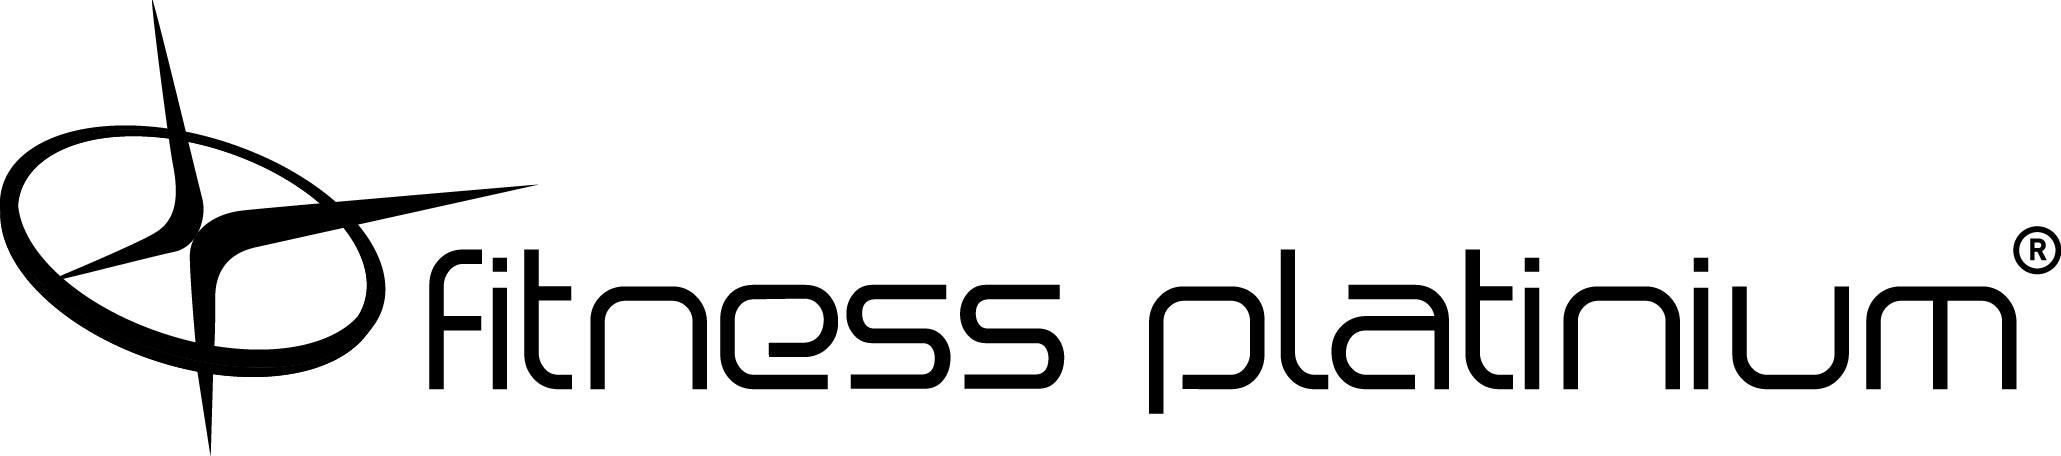 Fitness Platinium logo